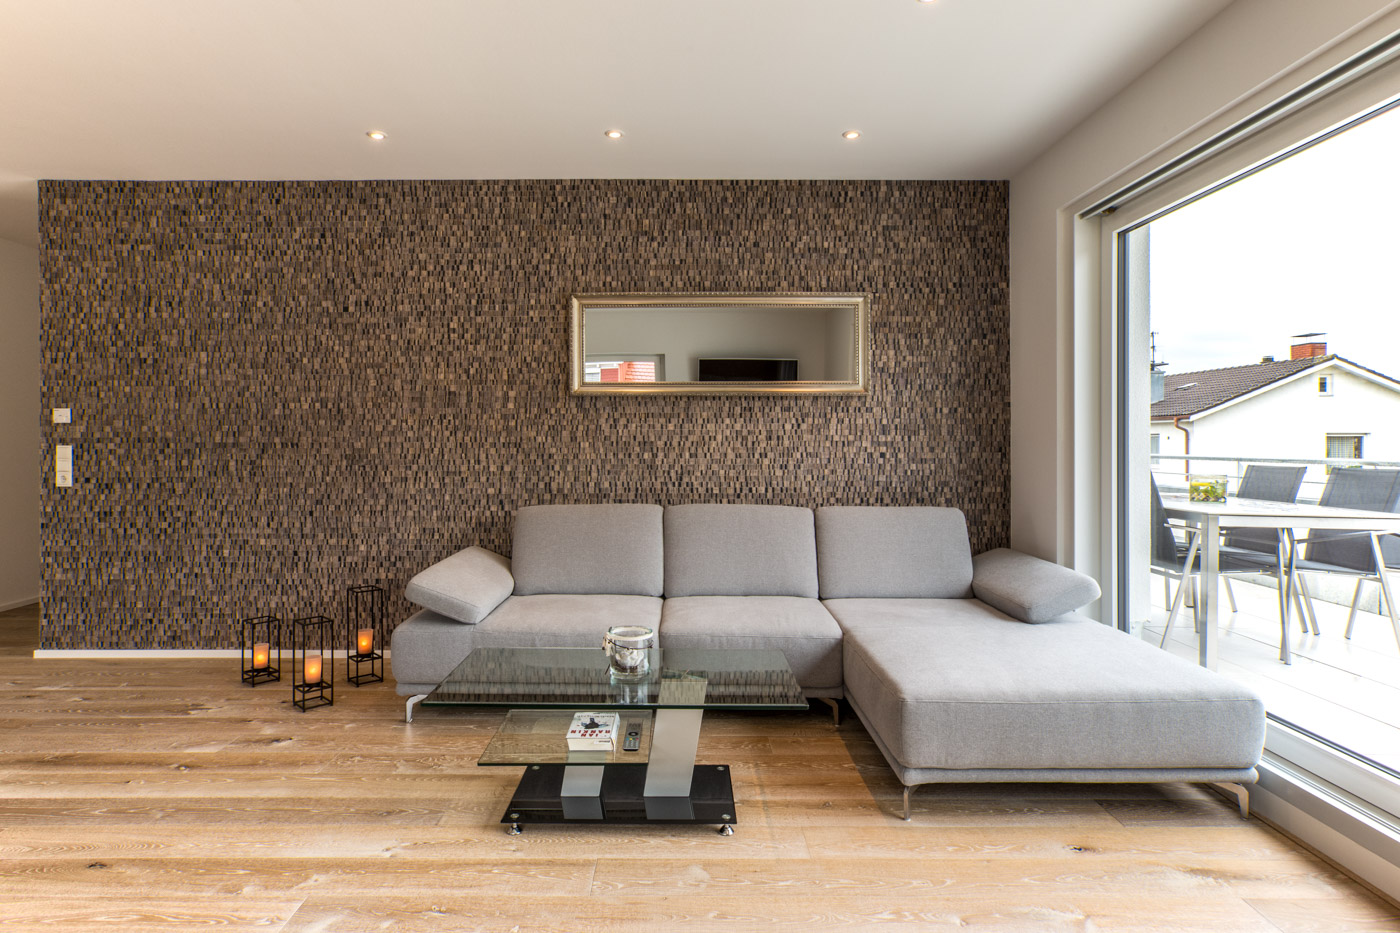 Wohngefühl  Innenausbau & Der Laden  Neubau Wohnung